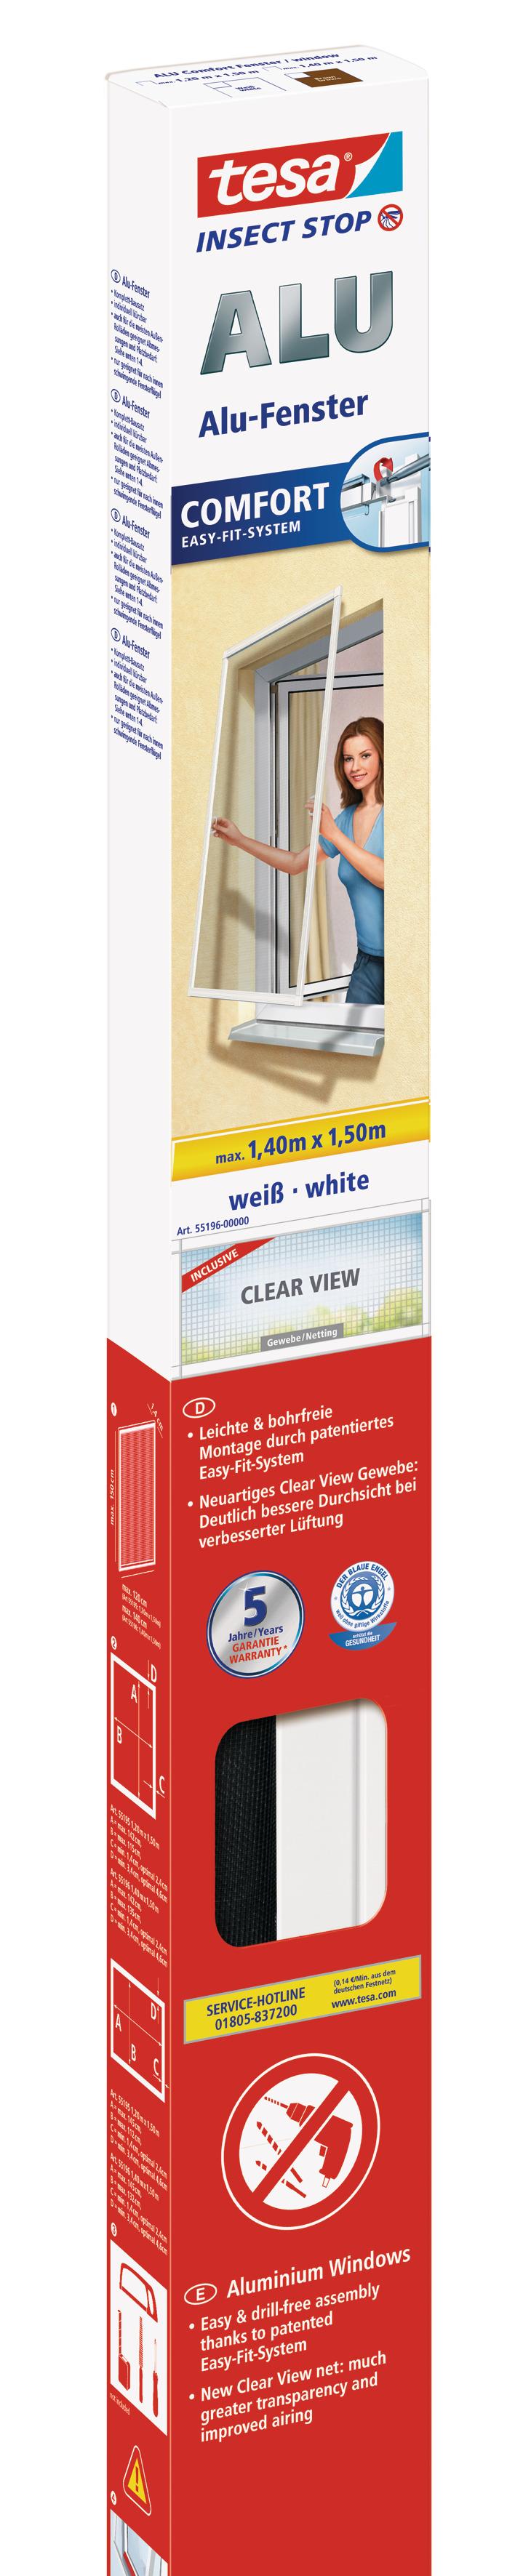 tesa Fliegengitter ALU Comfort Fenster 1,5 m : 1,5 m weiß